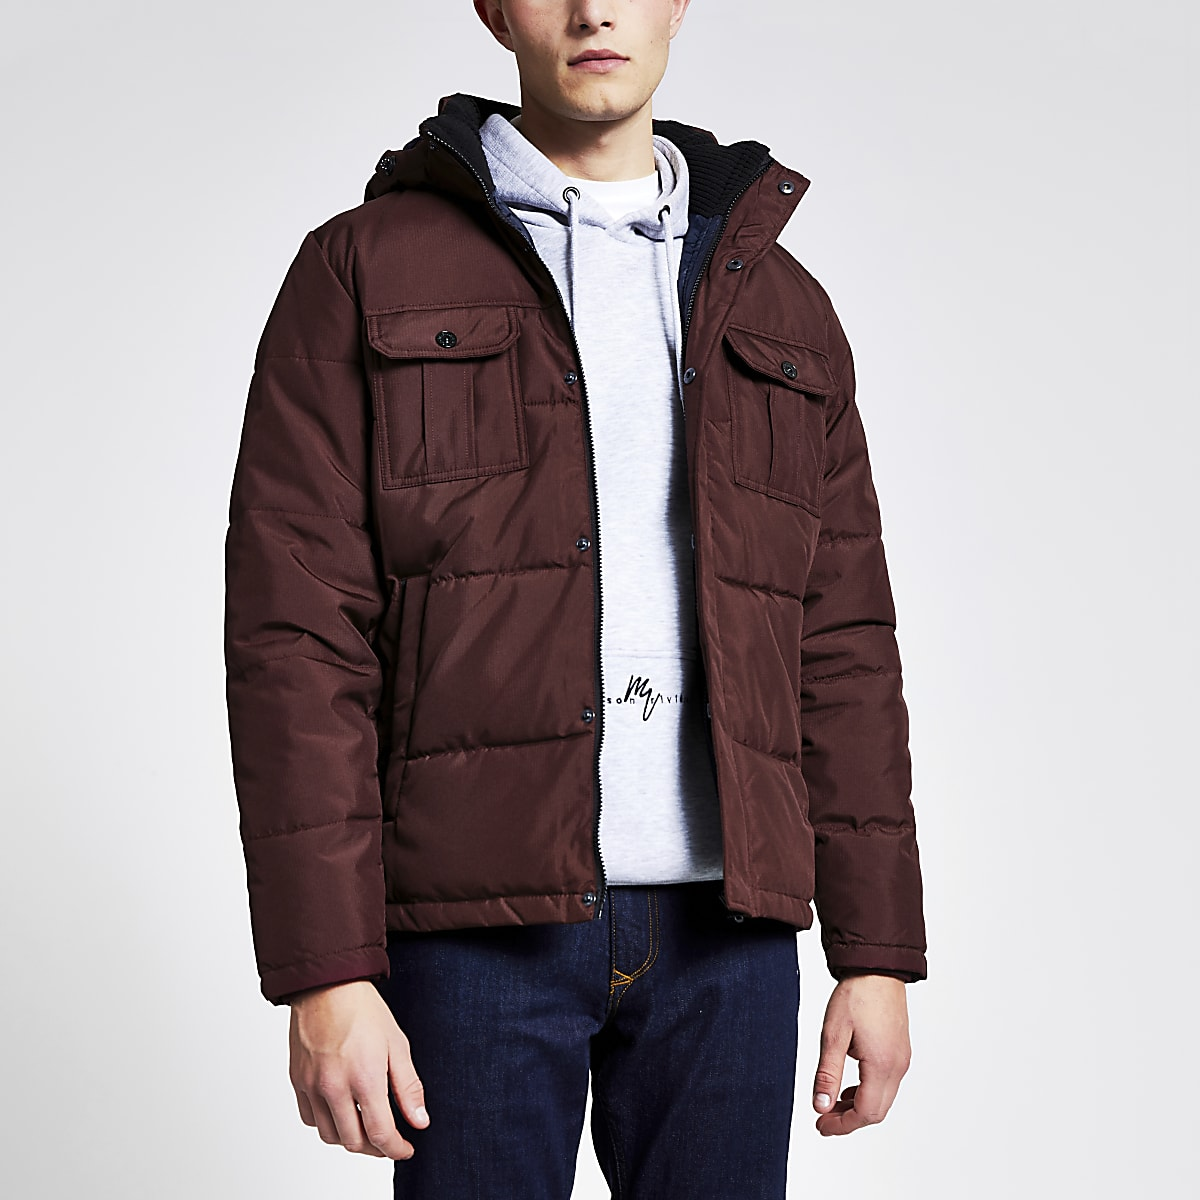 Jack & Jones dark red hooded padded jacket